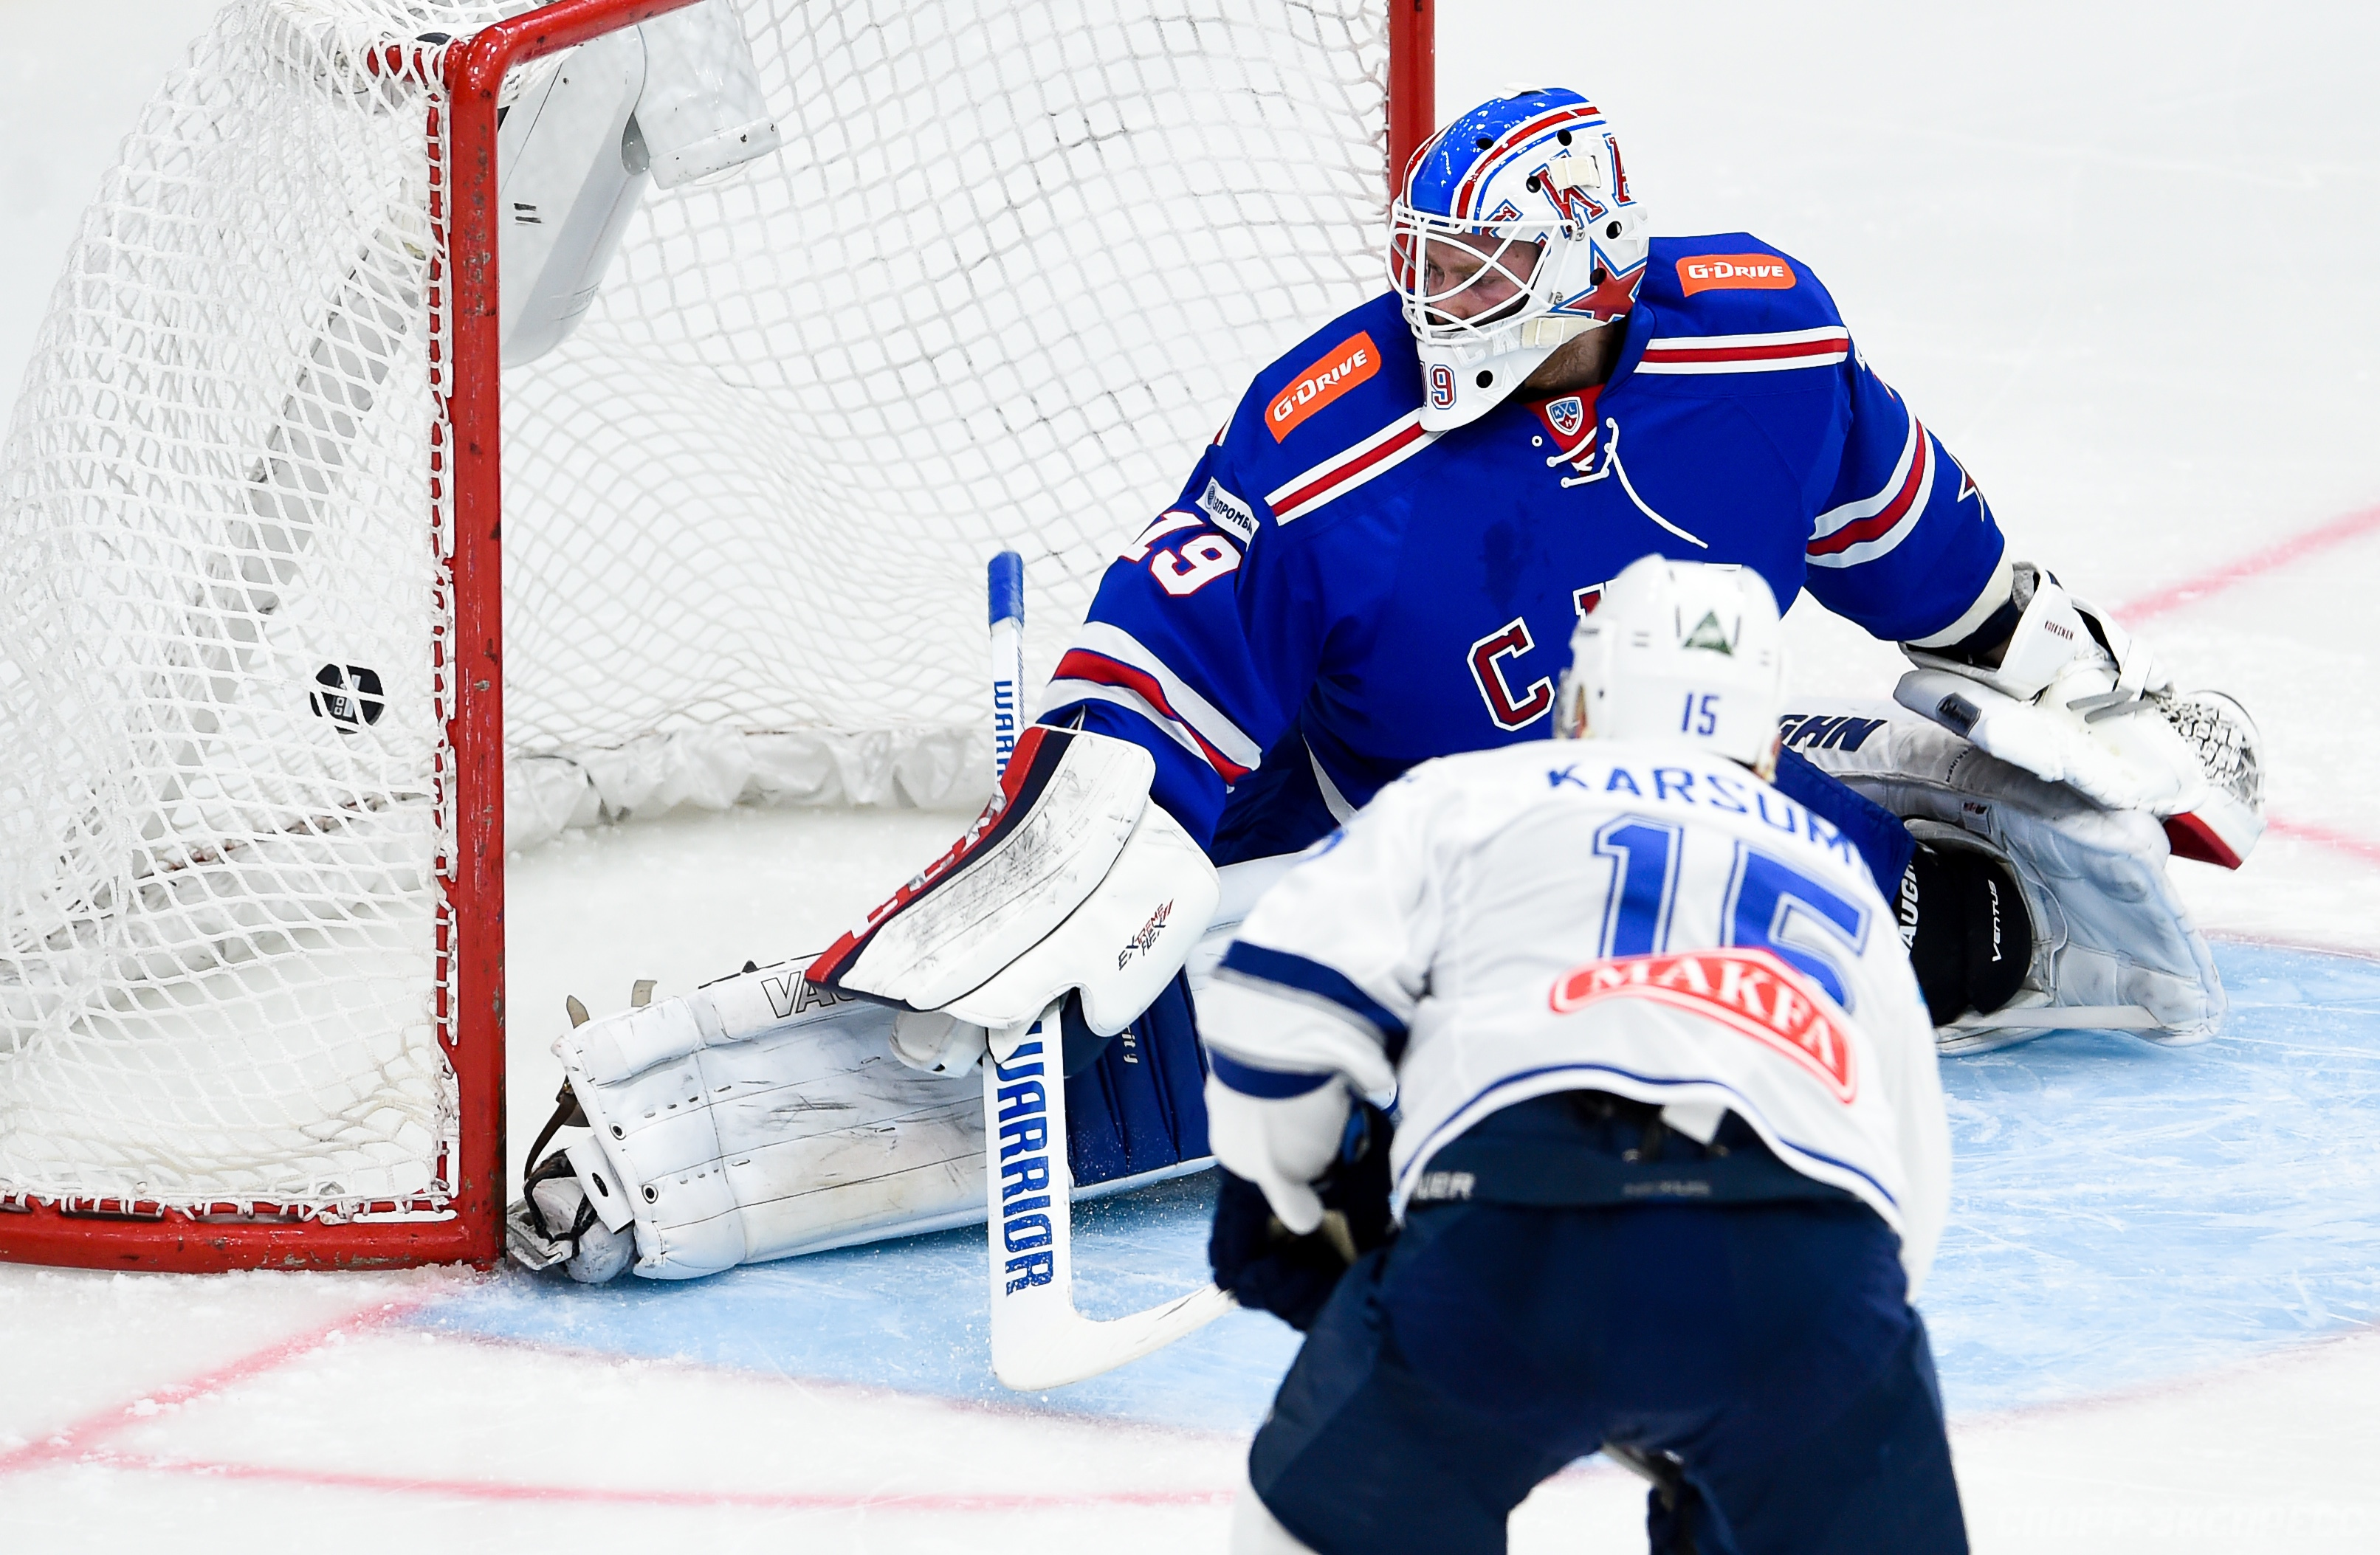 Прогноз на КХЛ: Динамо Рига – СКА – 26 октября 2018 года